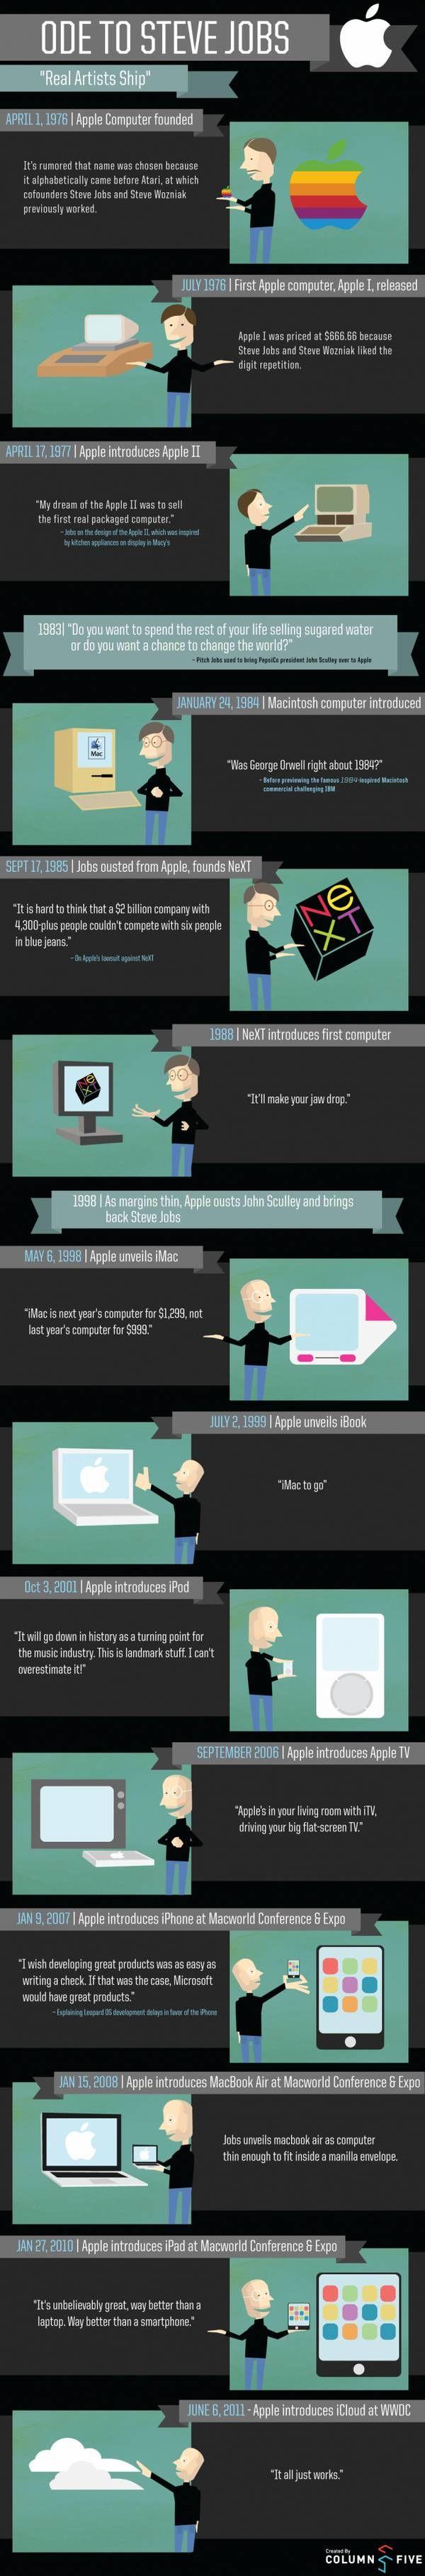 Tribute to the career of Steve Jobs